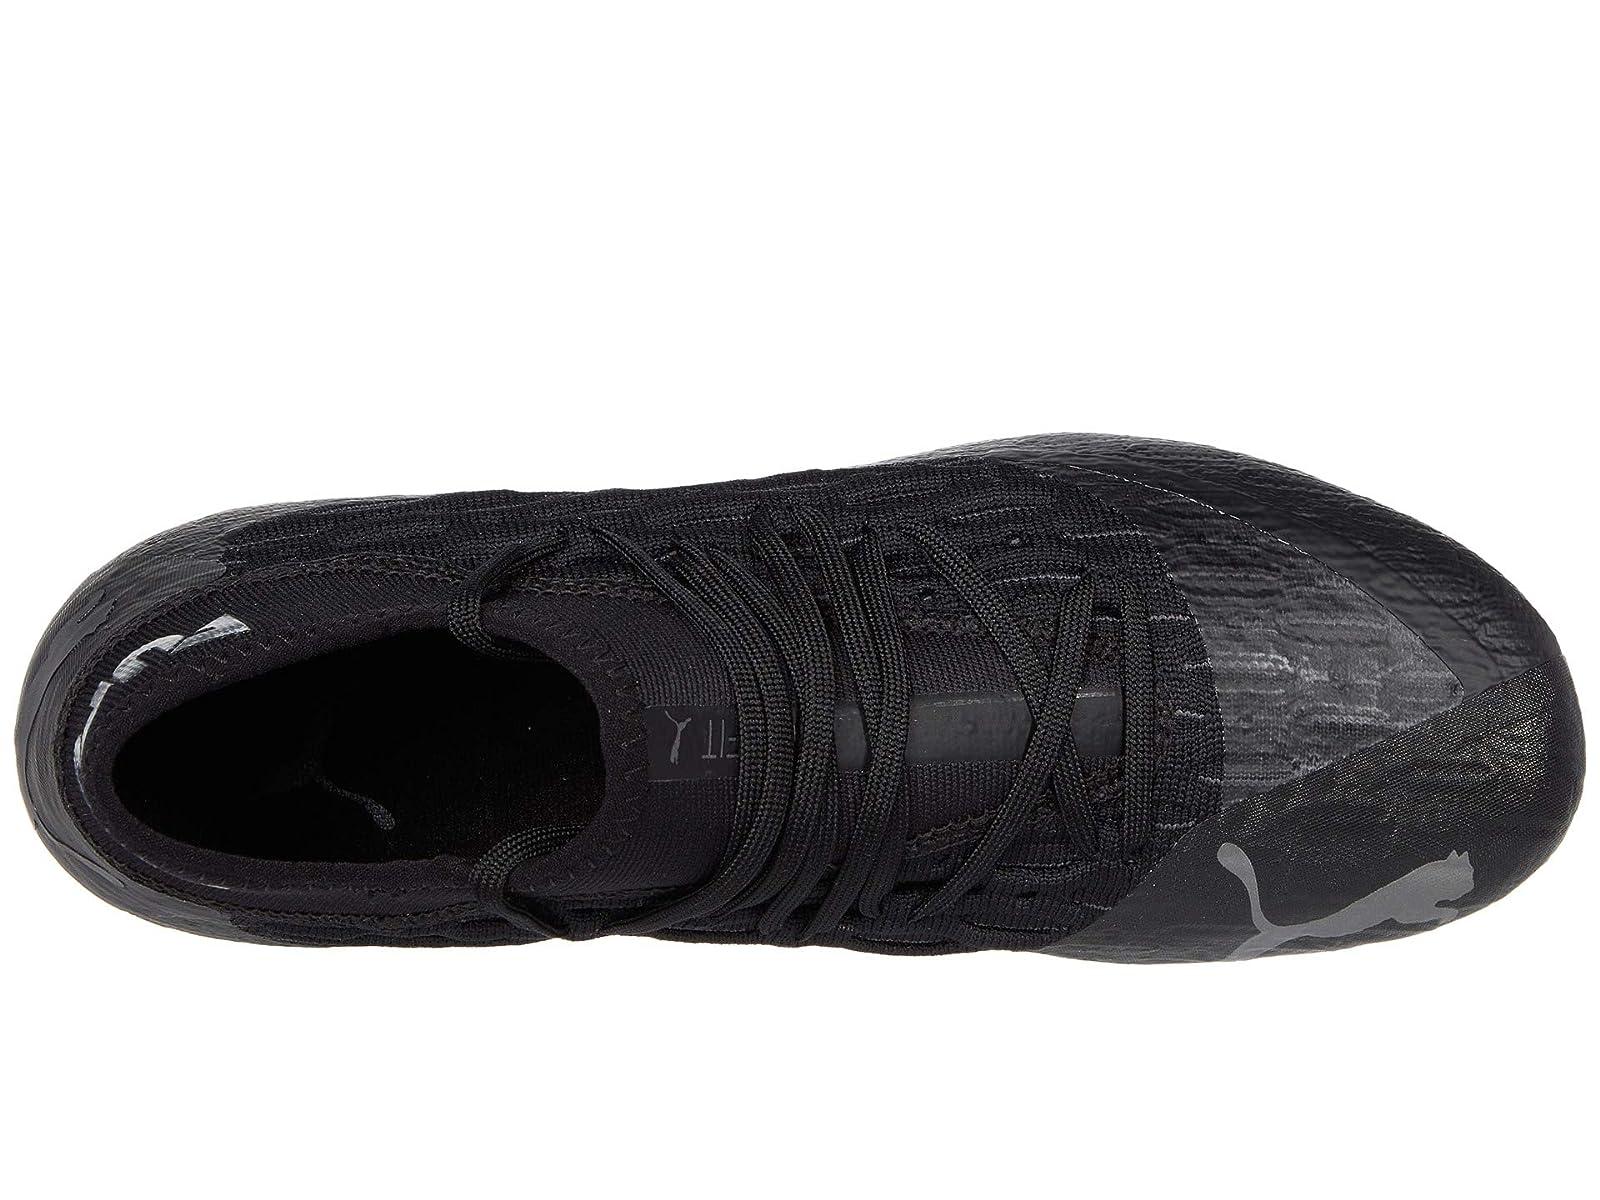 Man-039-s-Sneakers-amp-Athletic-Shoes-PUMA-Future-5-2-Netfit-FG-AG thumbnail 10